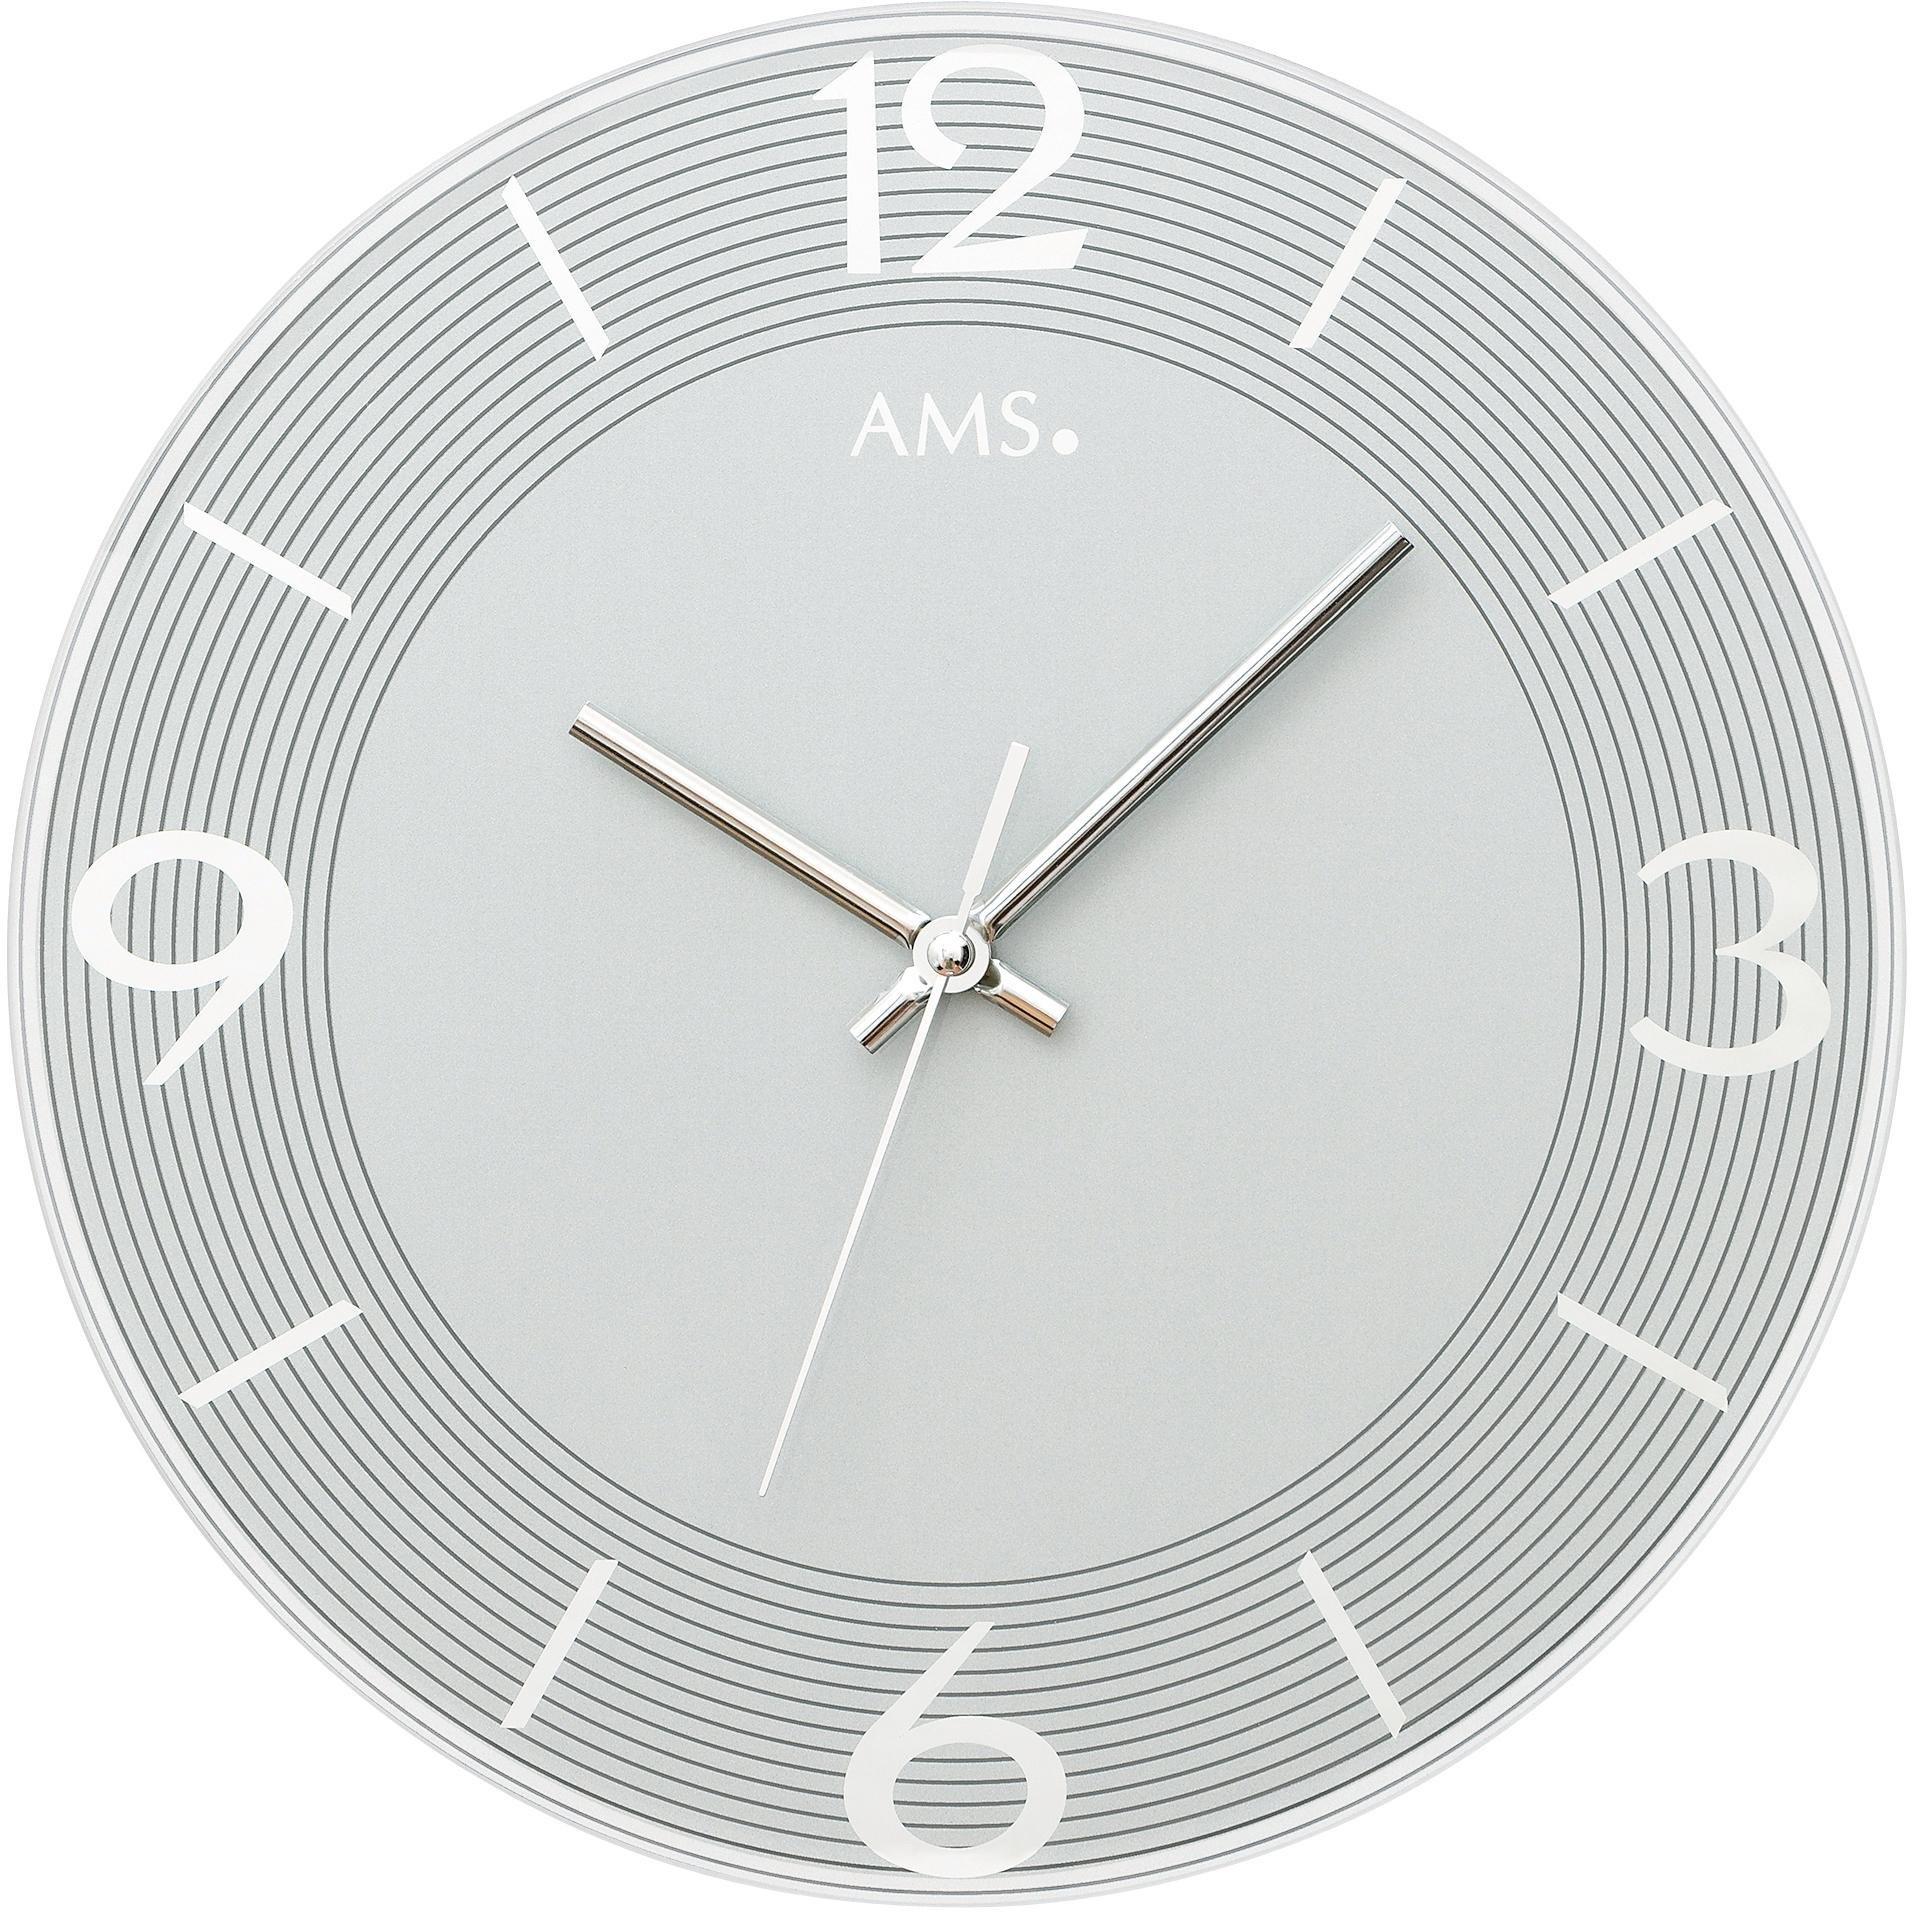 AMS wandklok »W9571« online kopen op otto.nl